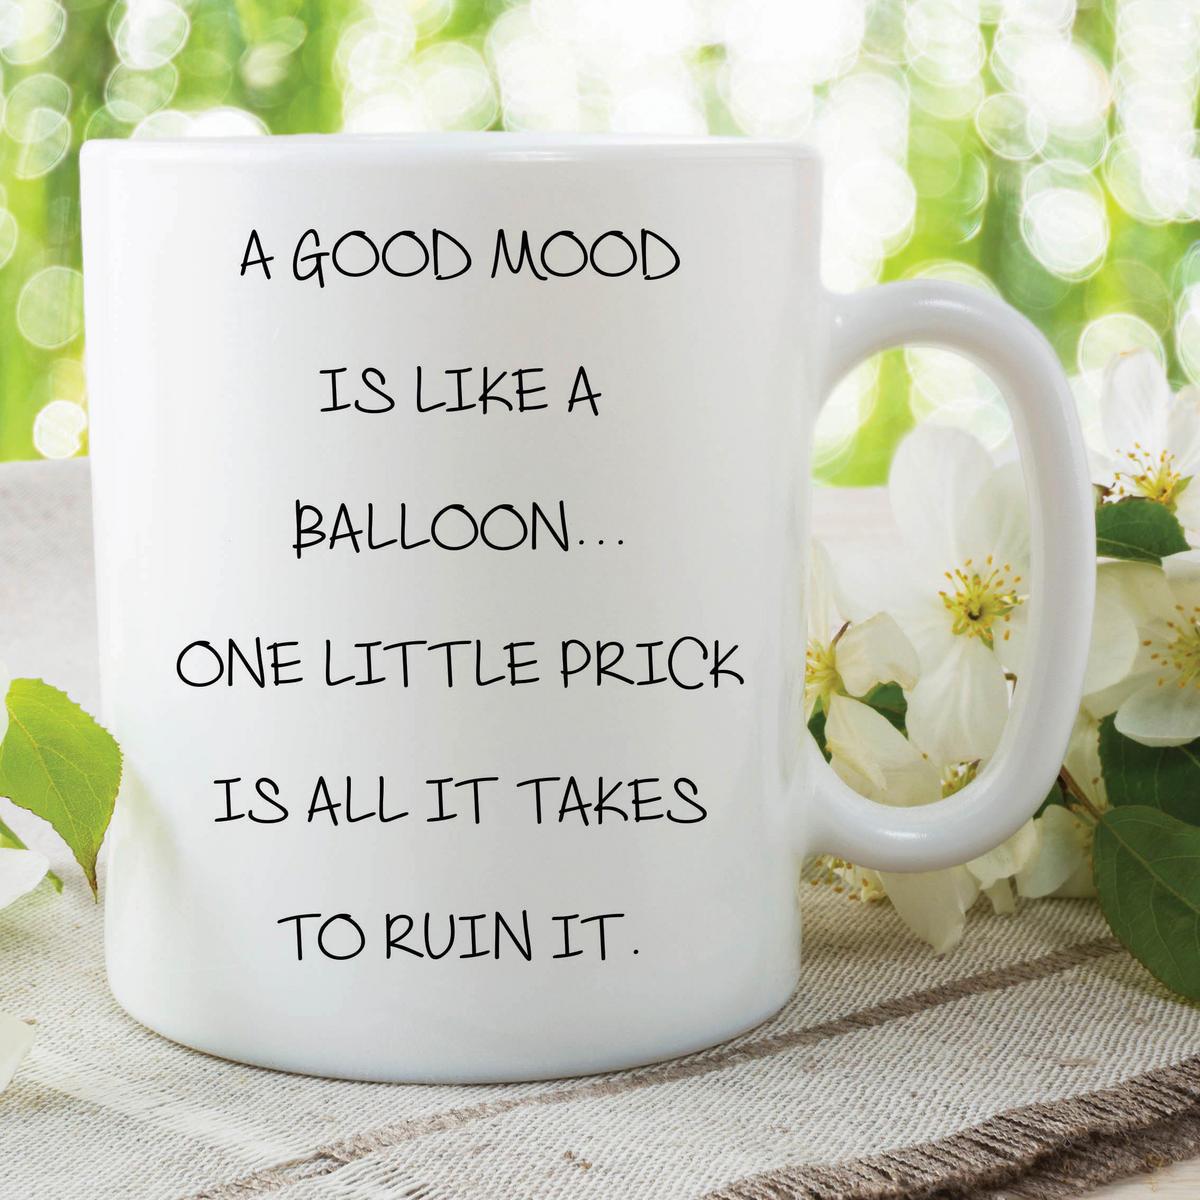 Funny Novelty Mugs Joke Adult Humour Best Friend Gift Office Work Cup WSDMUG606